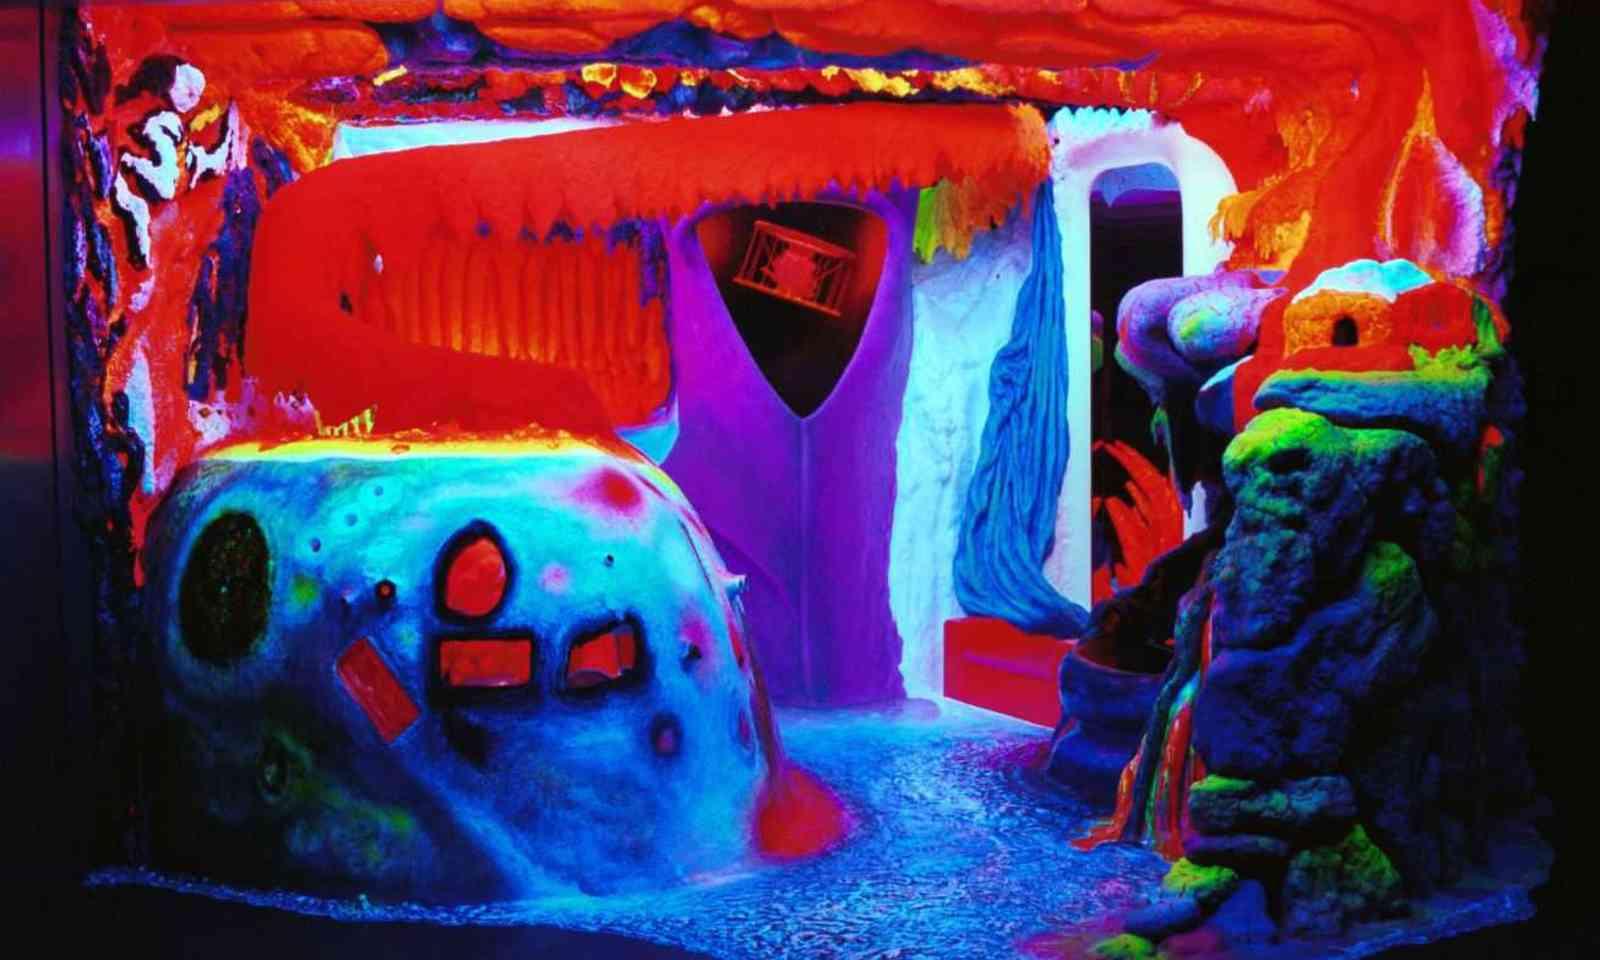 Welcome to Electric Ladyland (Nick Padlino)